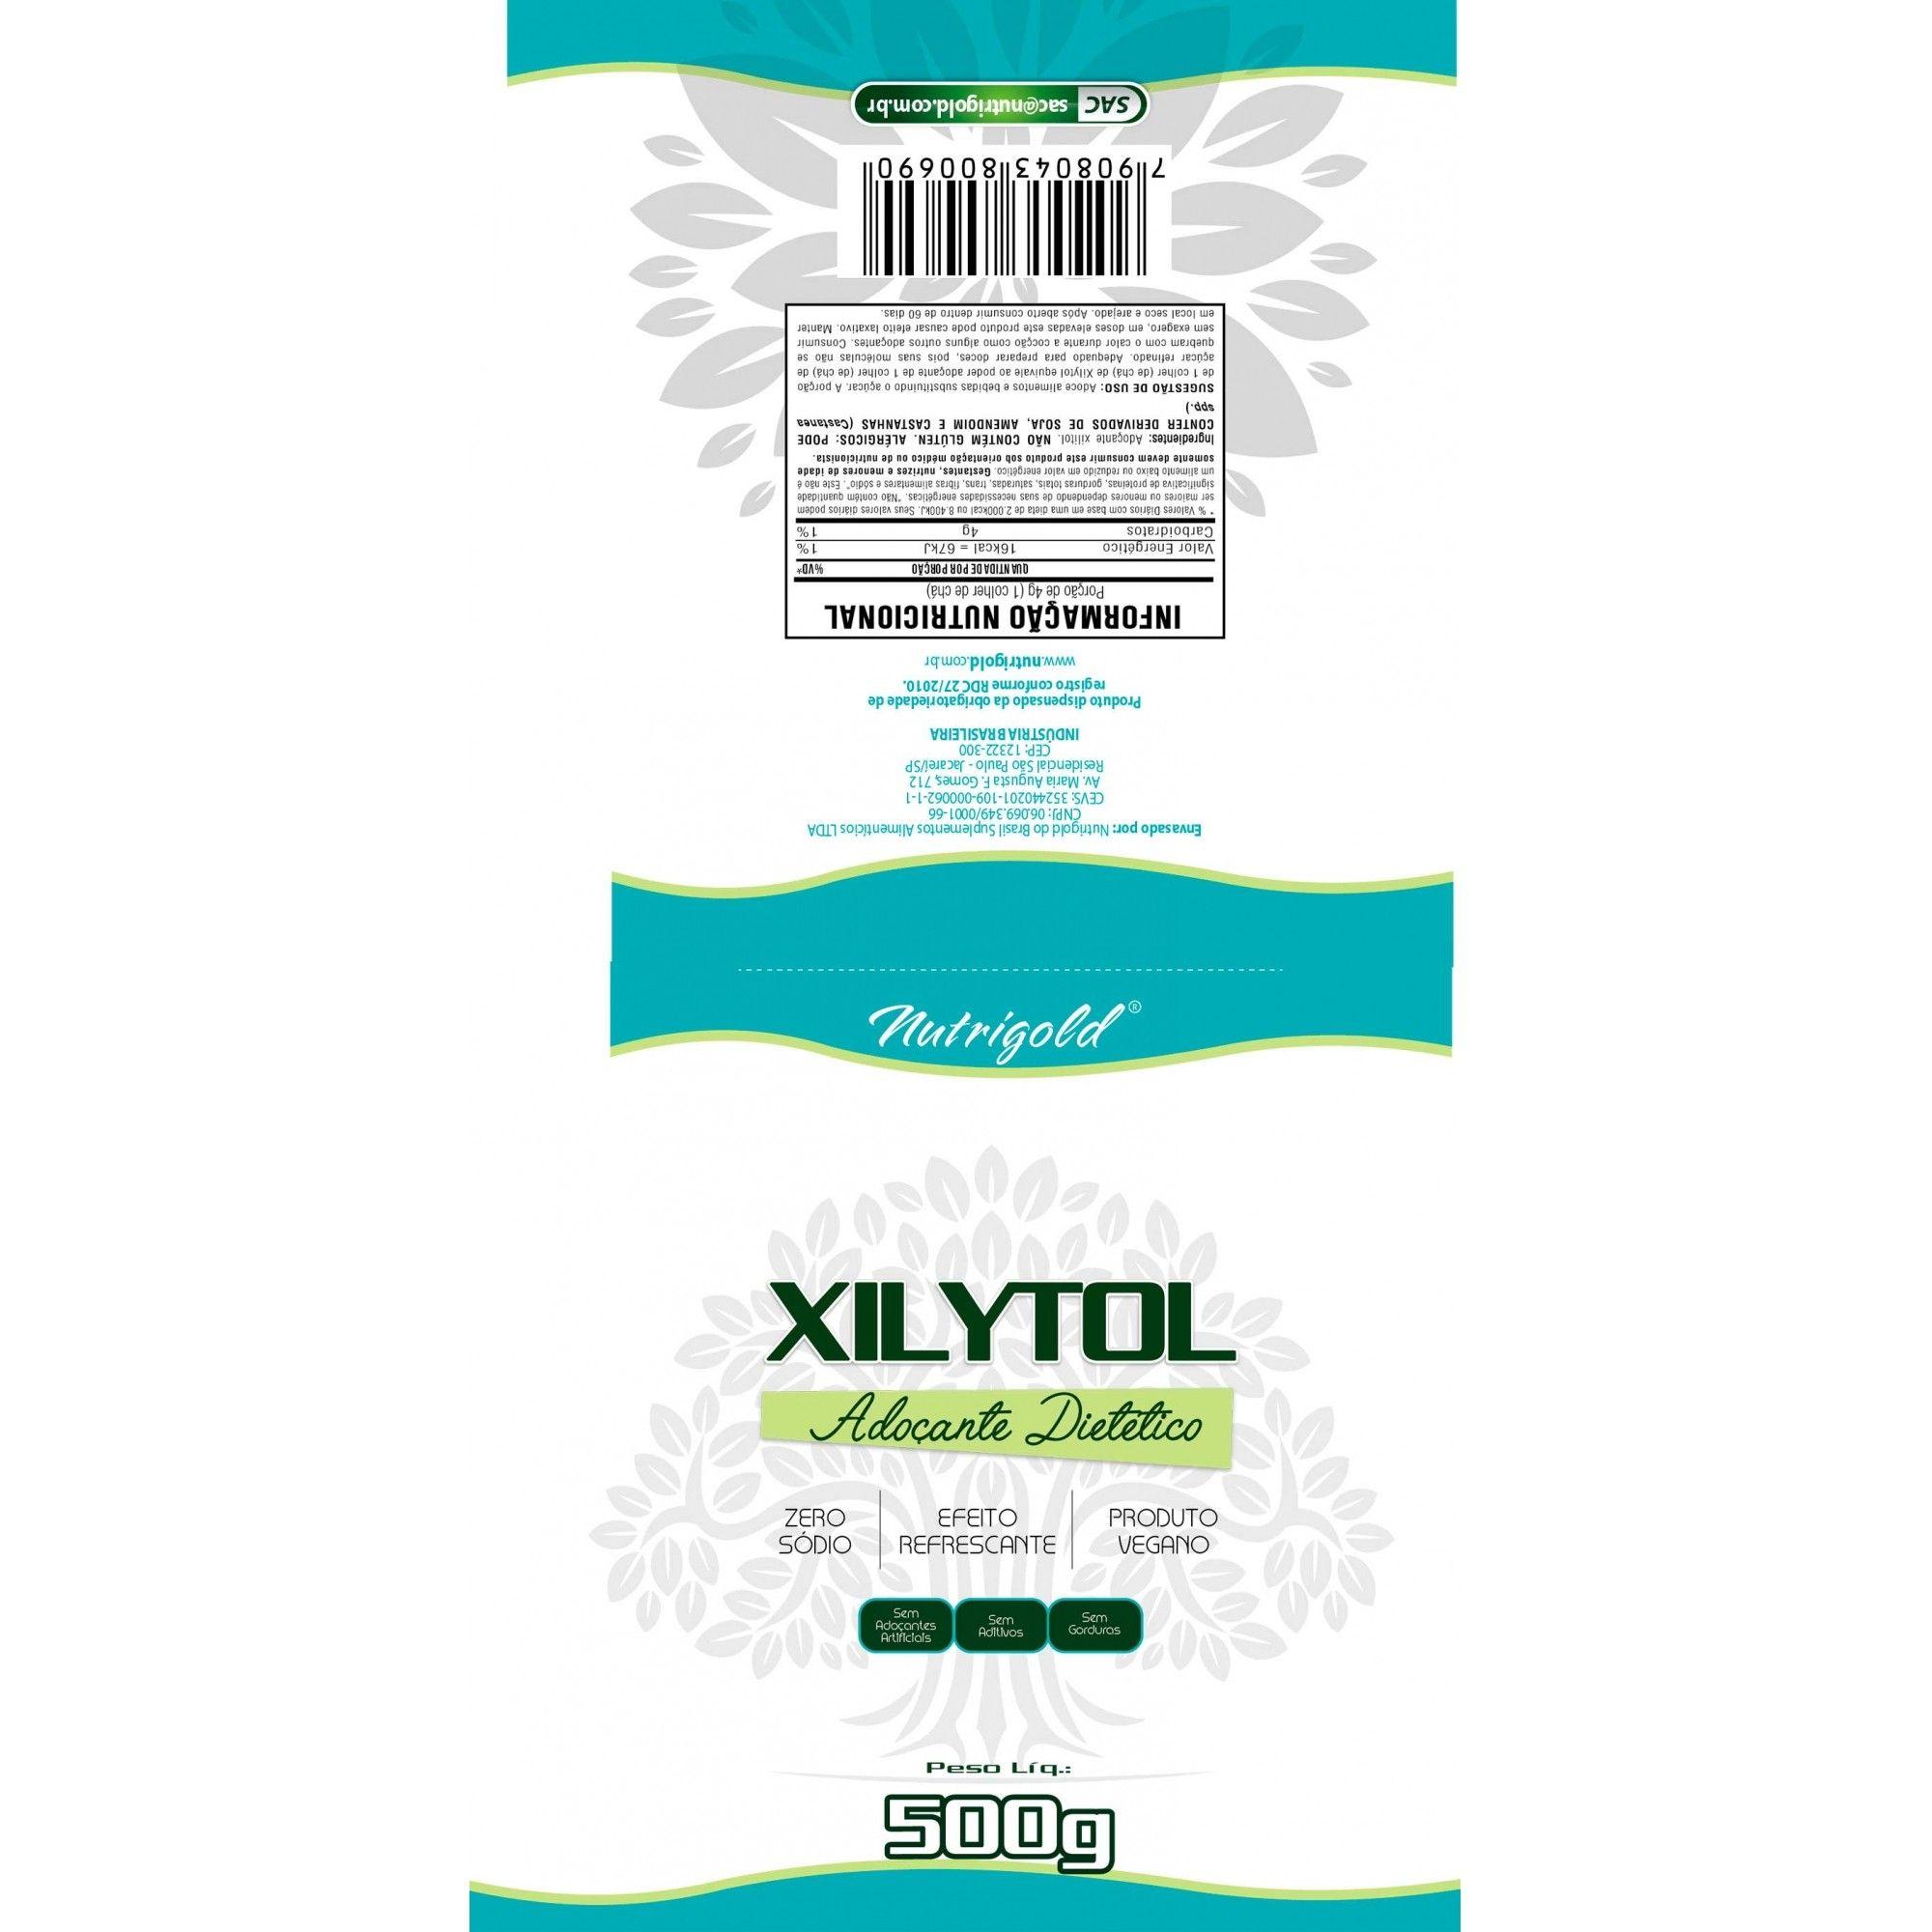 Kit 2 Xilytol 500g  Adoçante Dietético 100% Puro